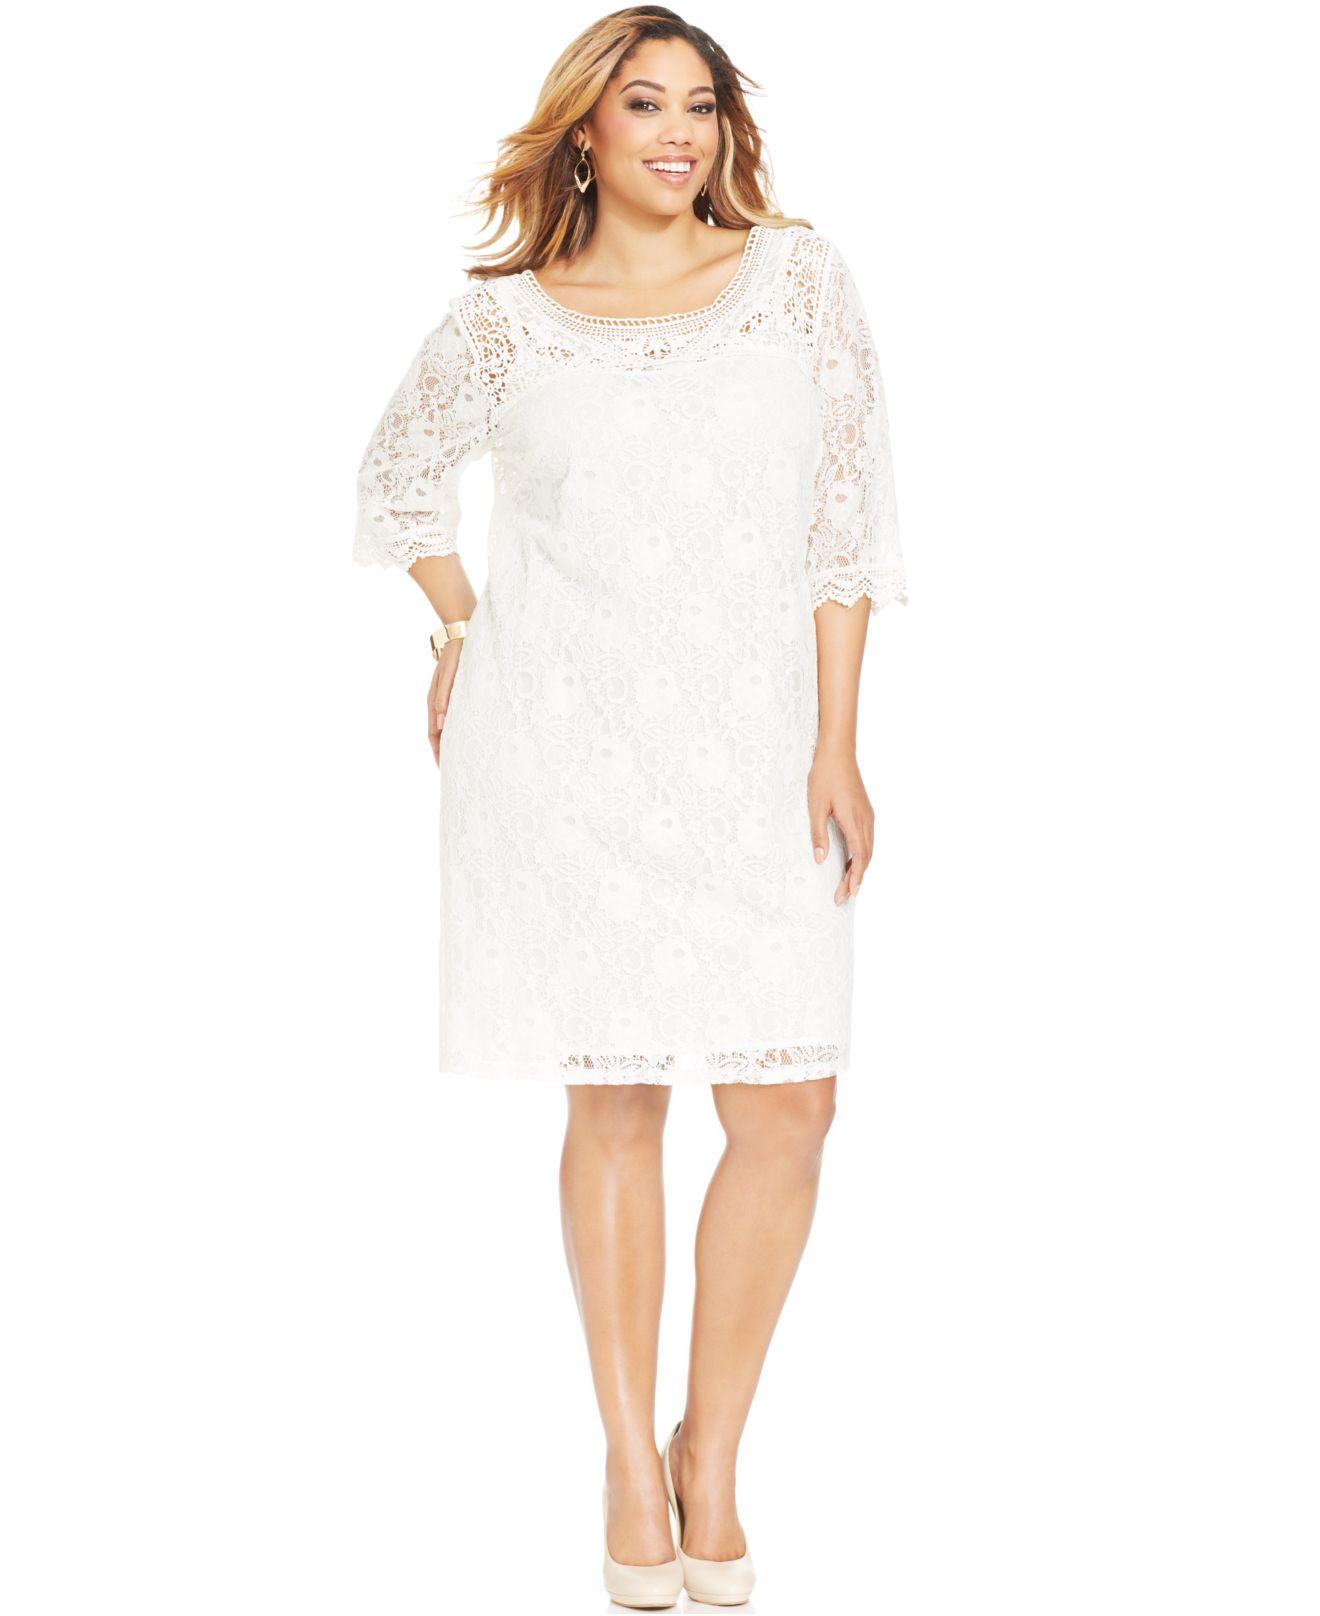 Spense White Plus Size Three-Quarter-Sleeve Lace Dress